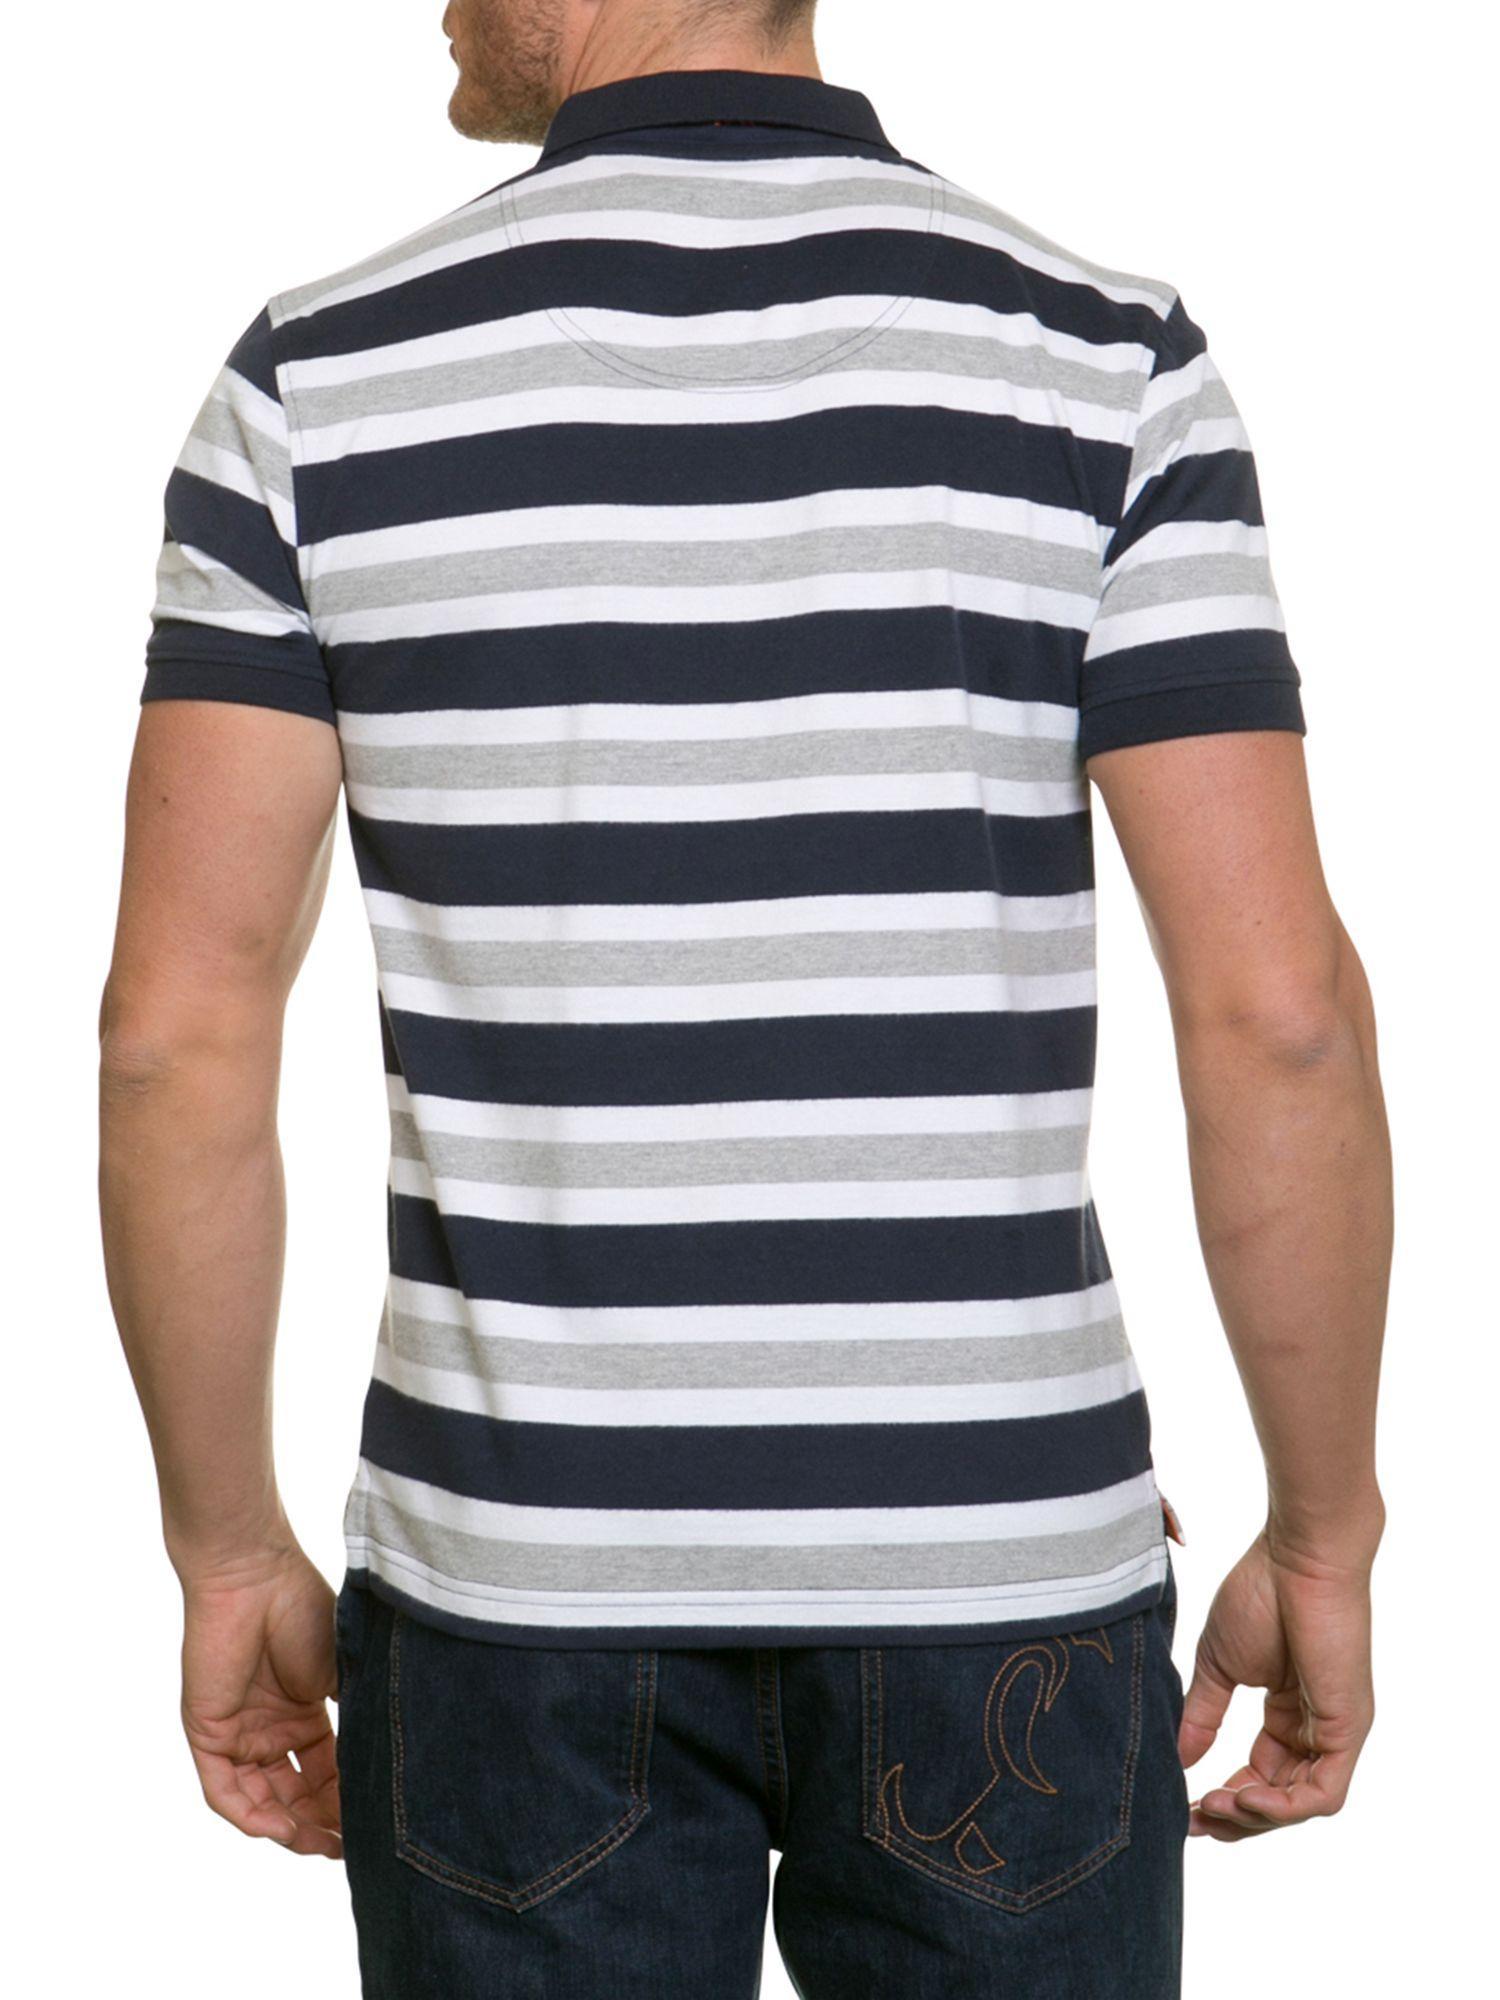 Raging Bull Cotton Big & Tall Multi Stripe Jersey Polo for Men